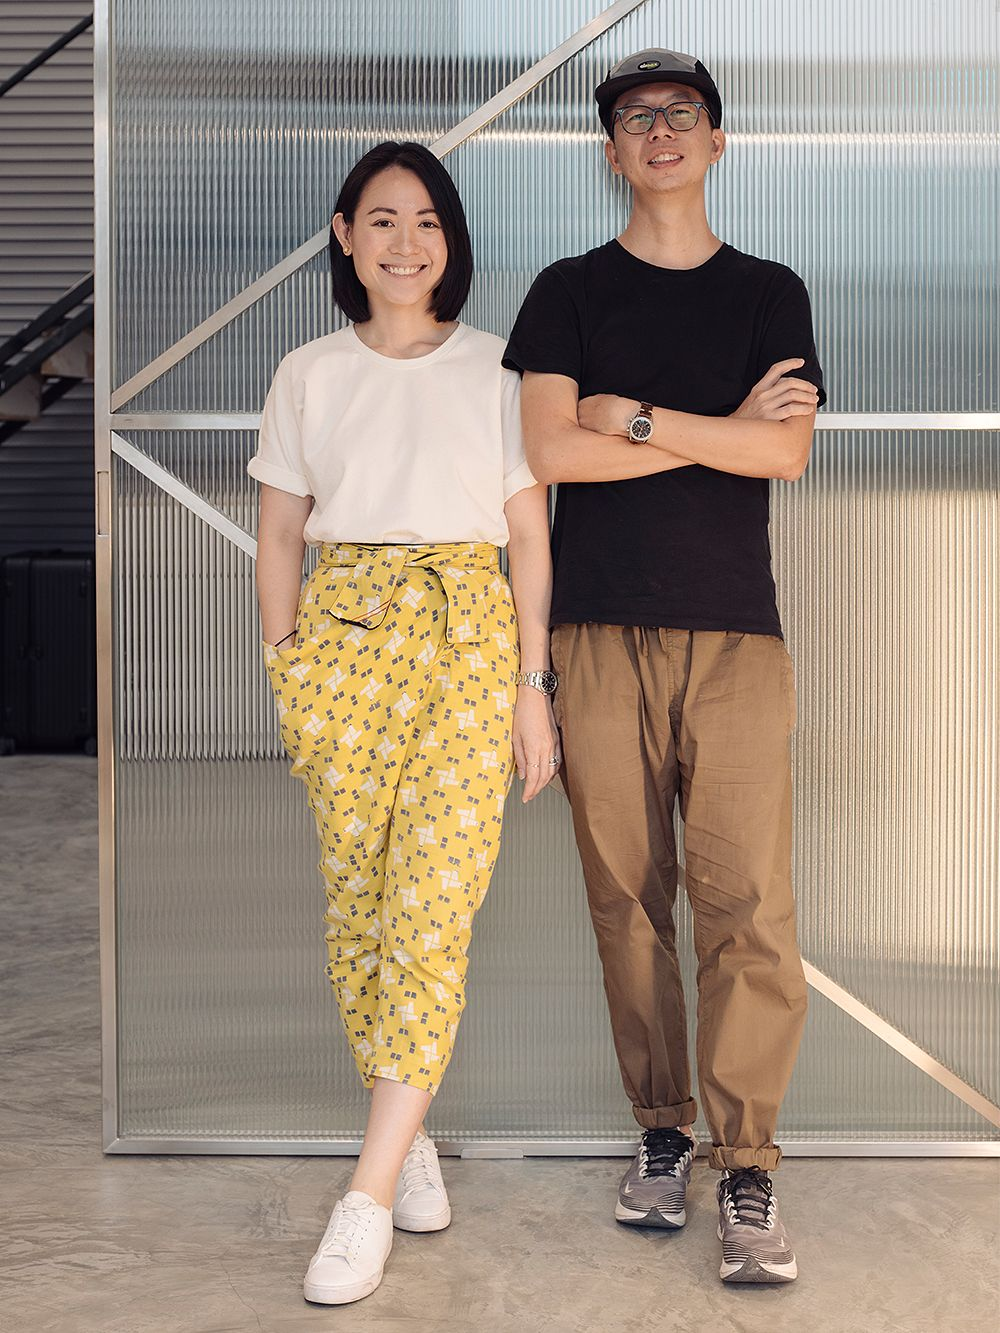 Creative directors Joy Loo and Khoo Kean Hu from the design agency WAFF